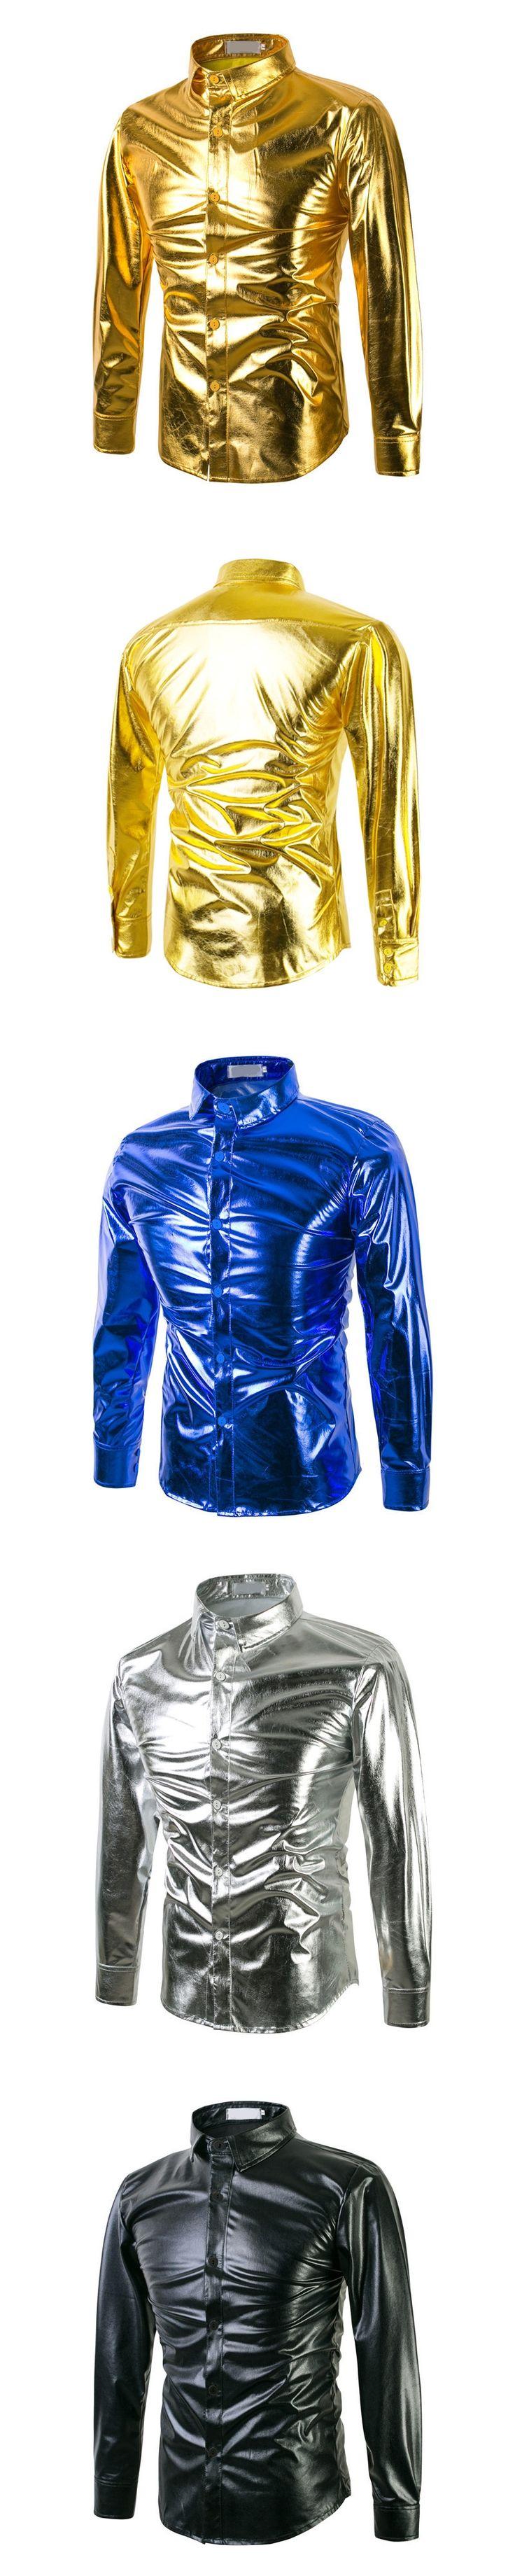 2017 brand new mens dress shirts with cufflinks Long sleeve fashion casual men shirt social costume golden clothing